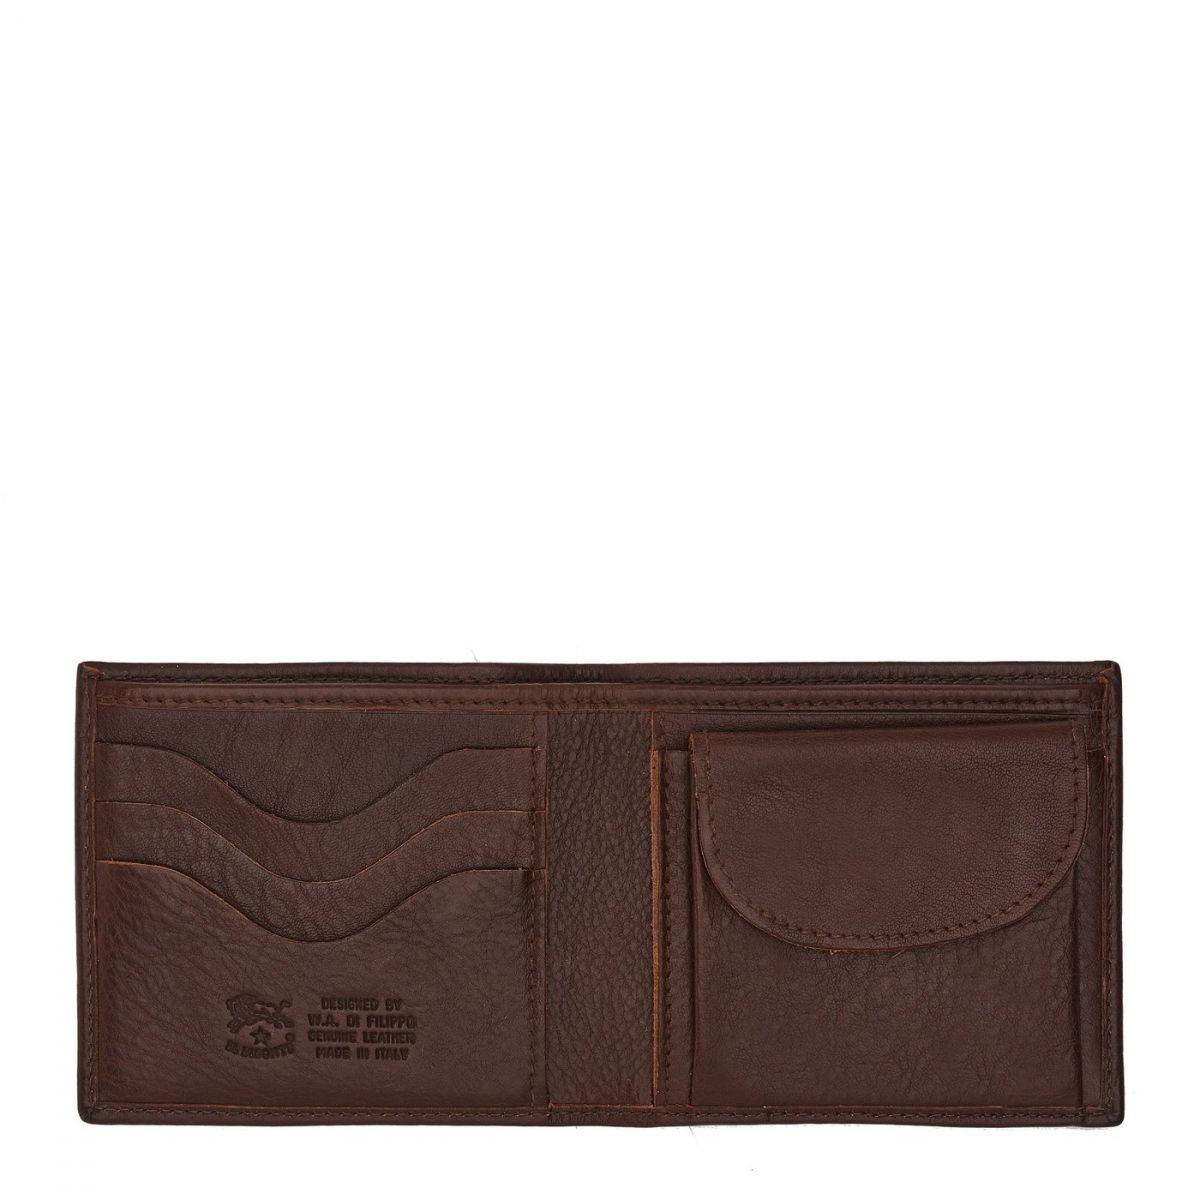 Men's Bi-Fold Wallet  in Cowhide Double Leather SBW007 color Brown | Details